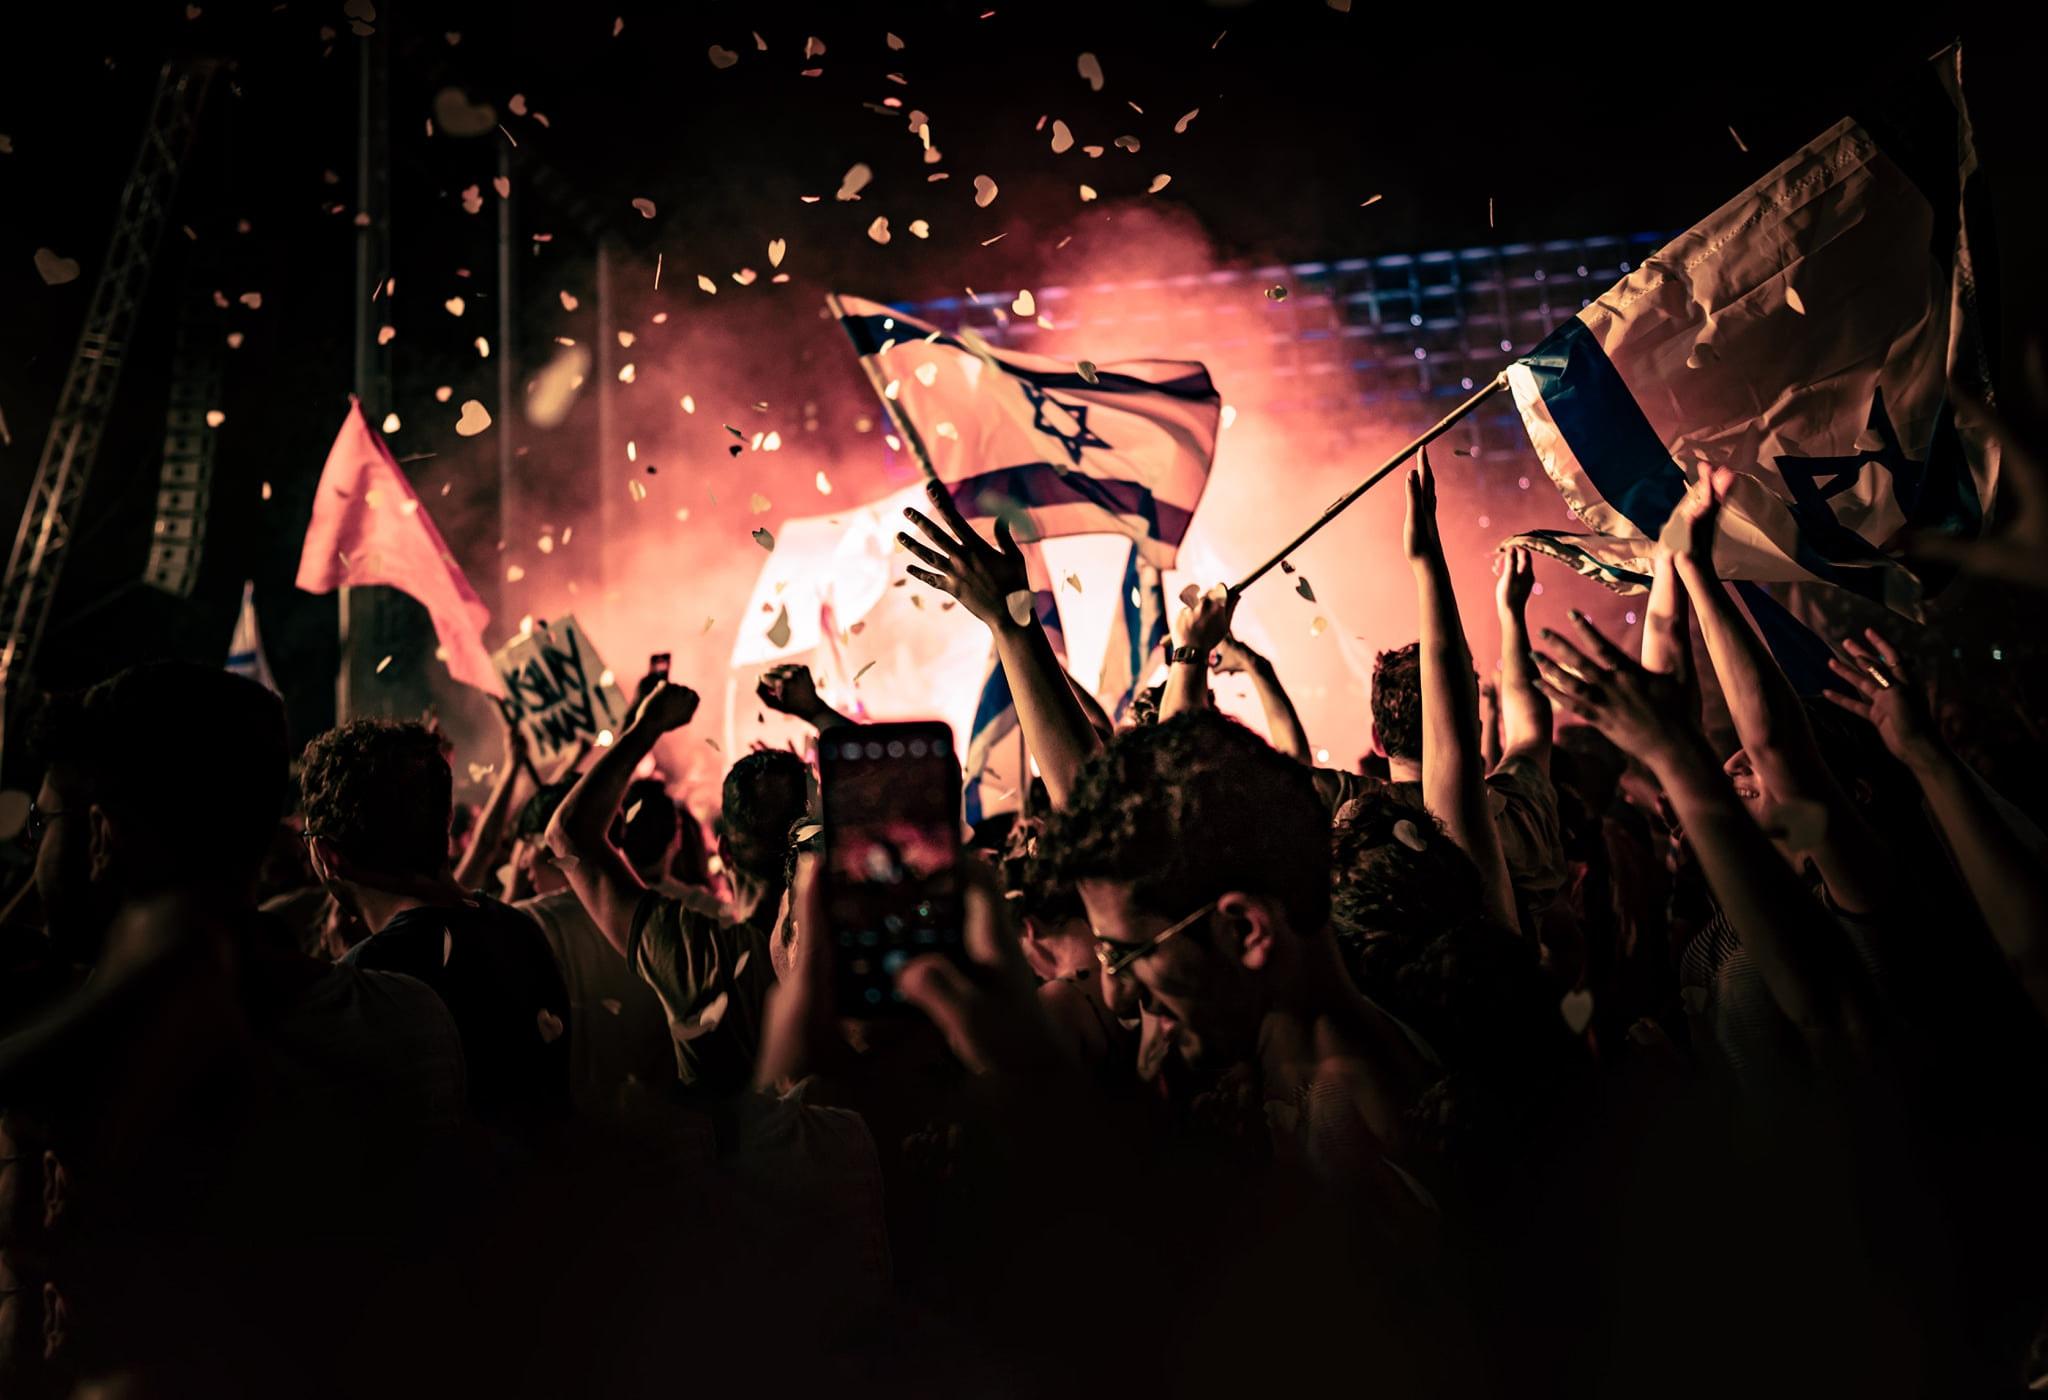 ido-מסיבת הסיום של מחאת בלפור בירושלים, יוני 2021 (צילום: עידו רז)